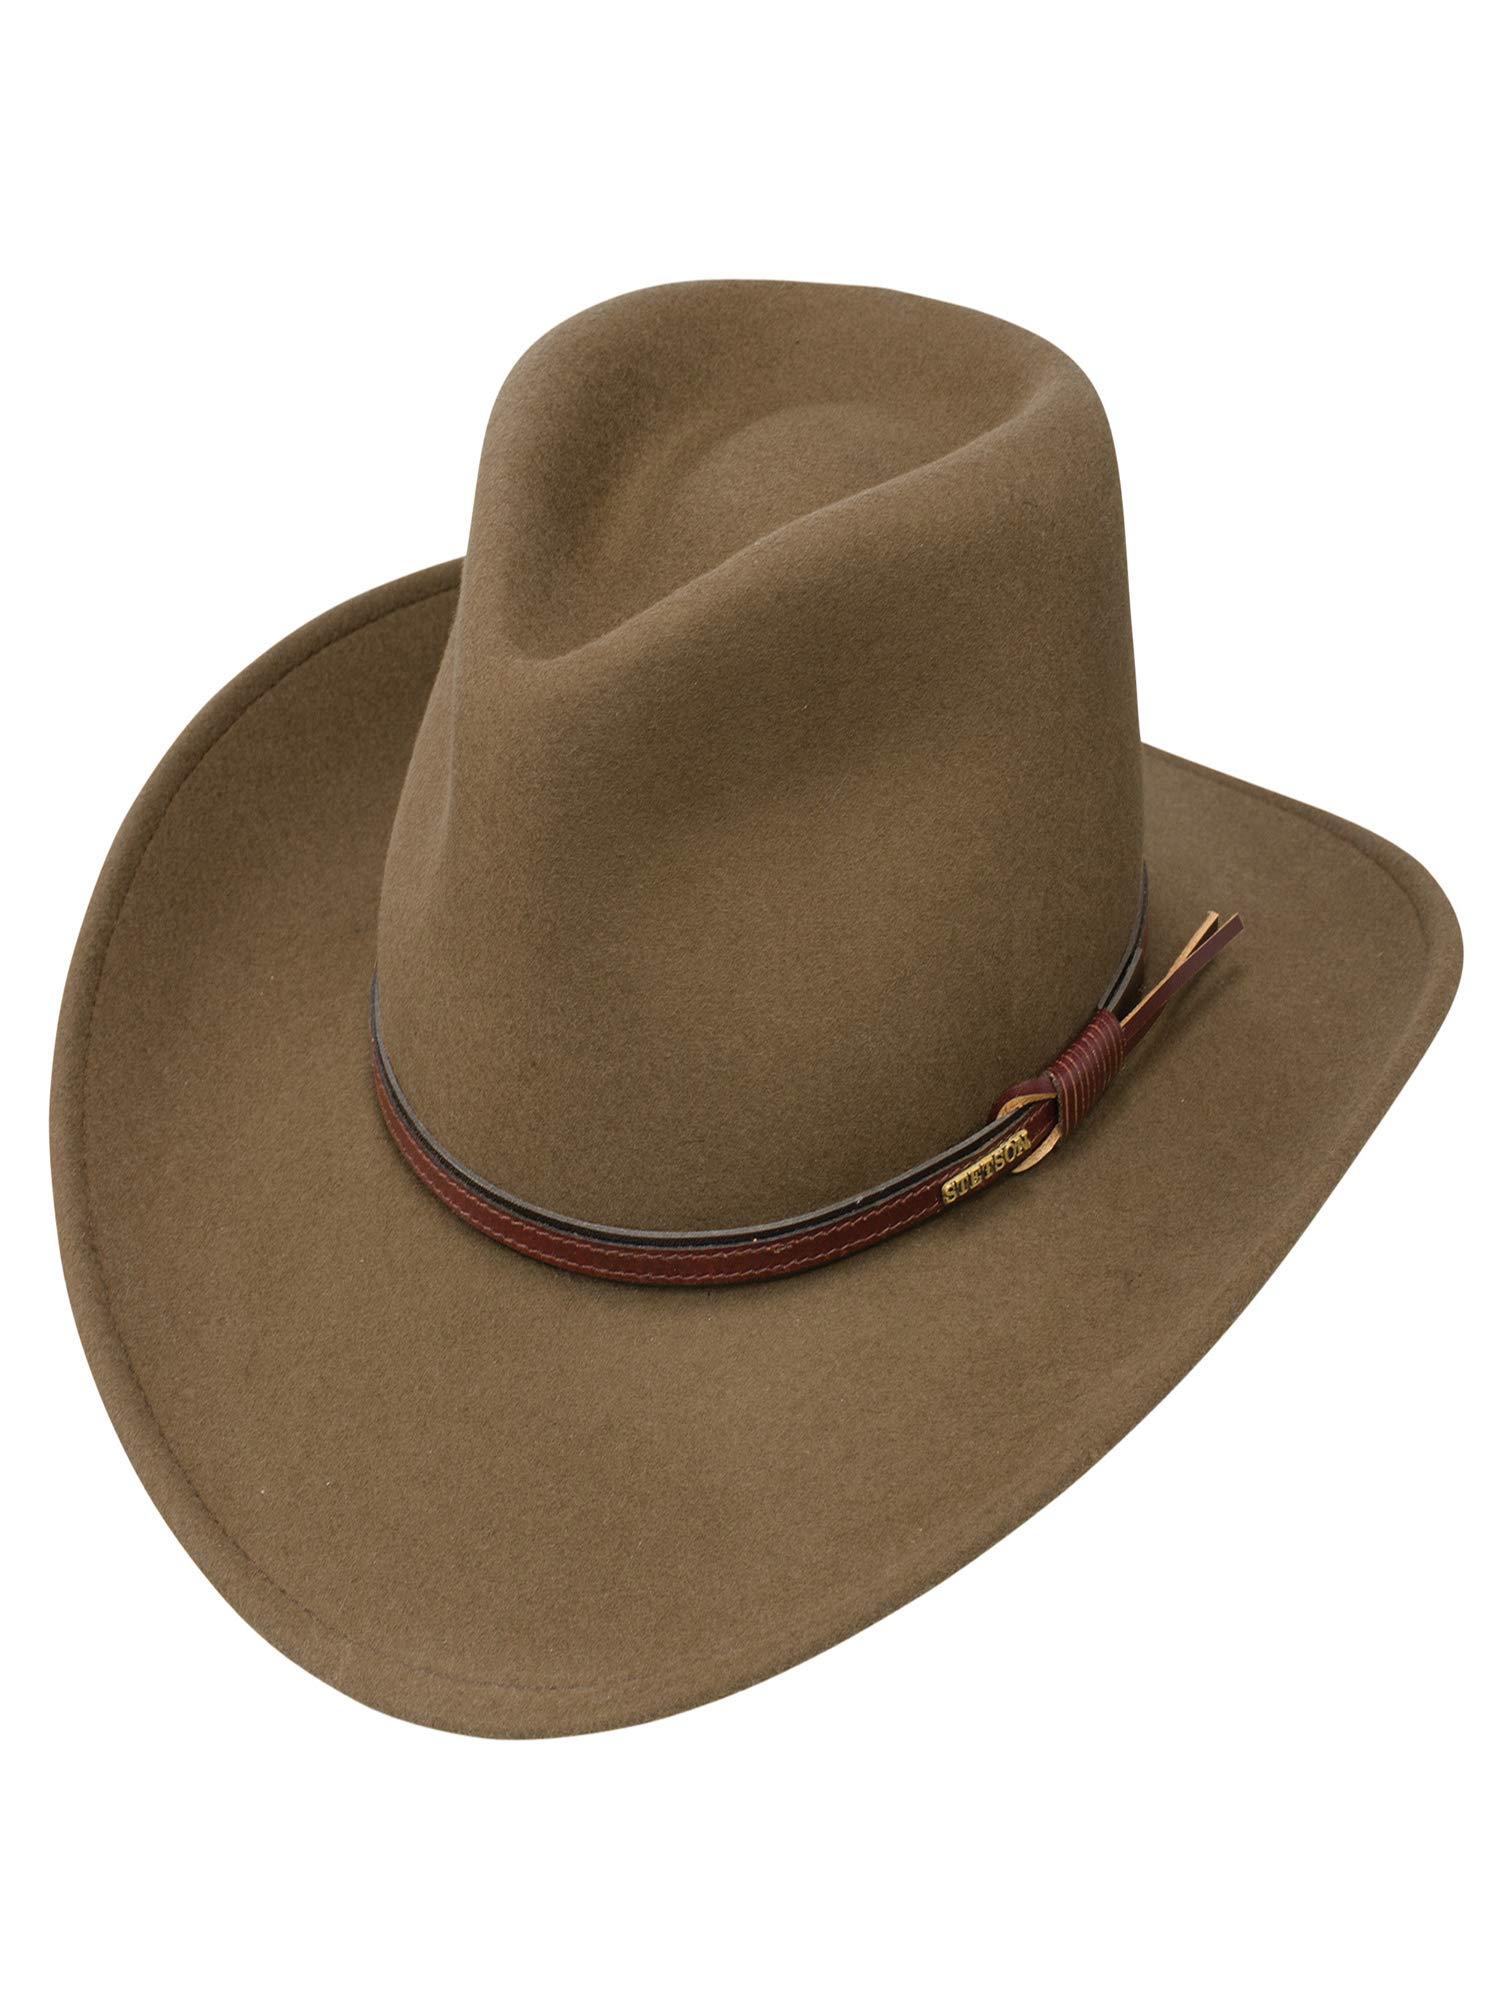 Stetson Bozeman Black Wool Crushable Cowboy Western Hat Medium